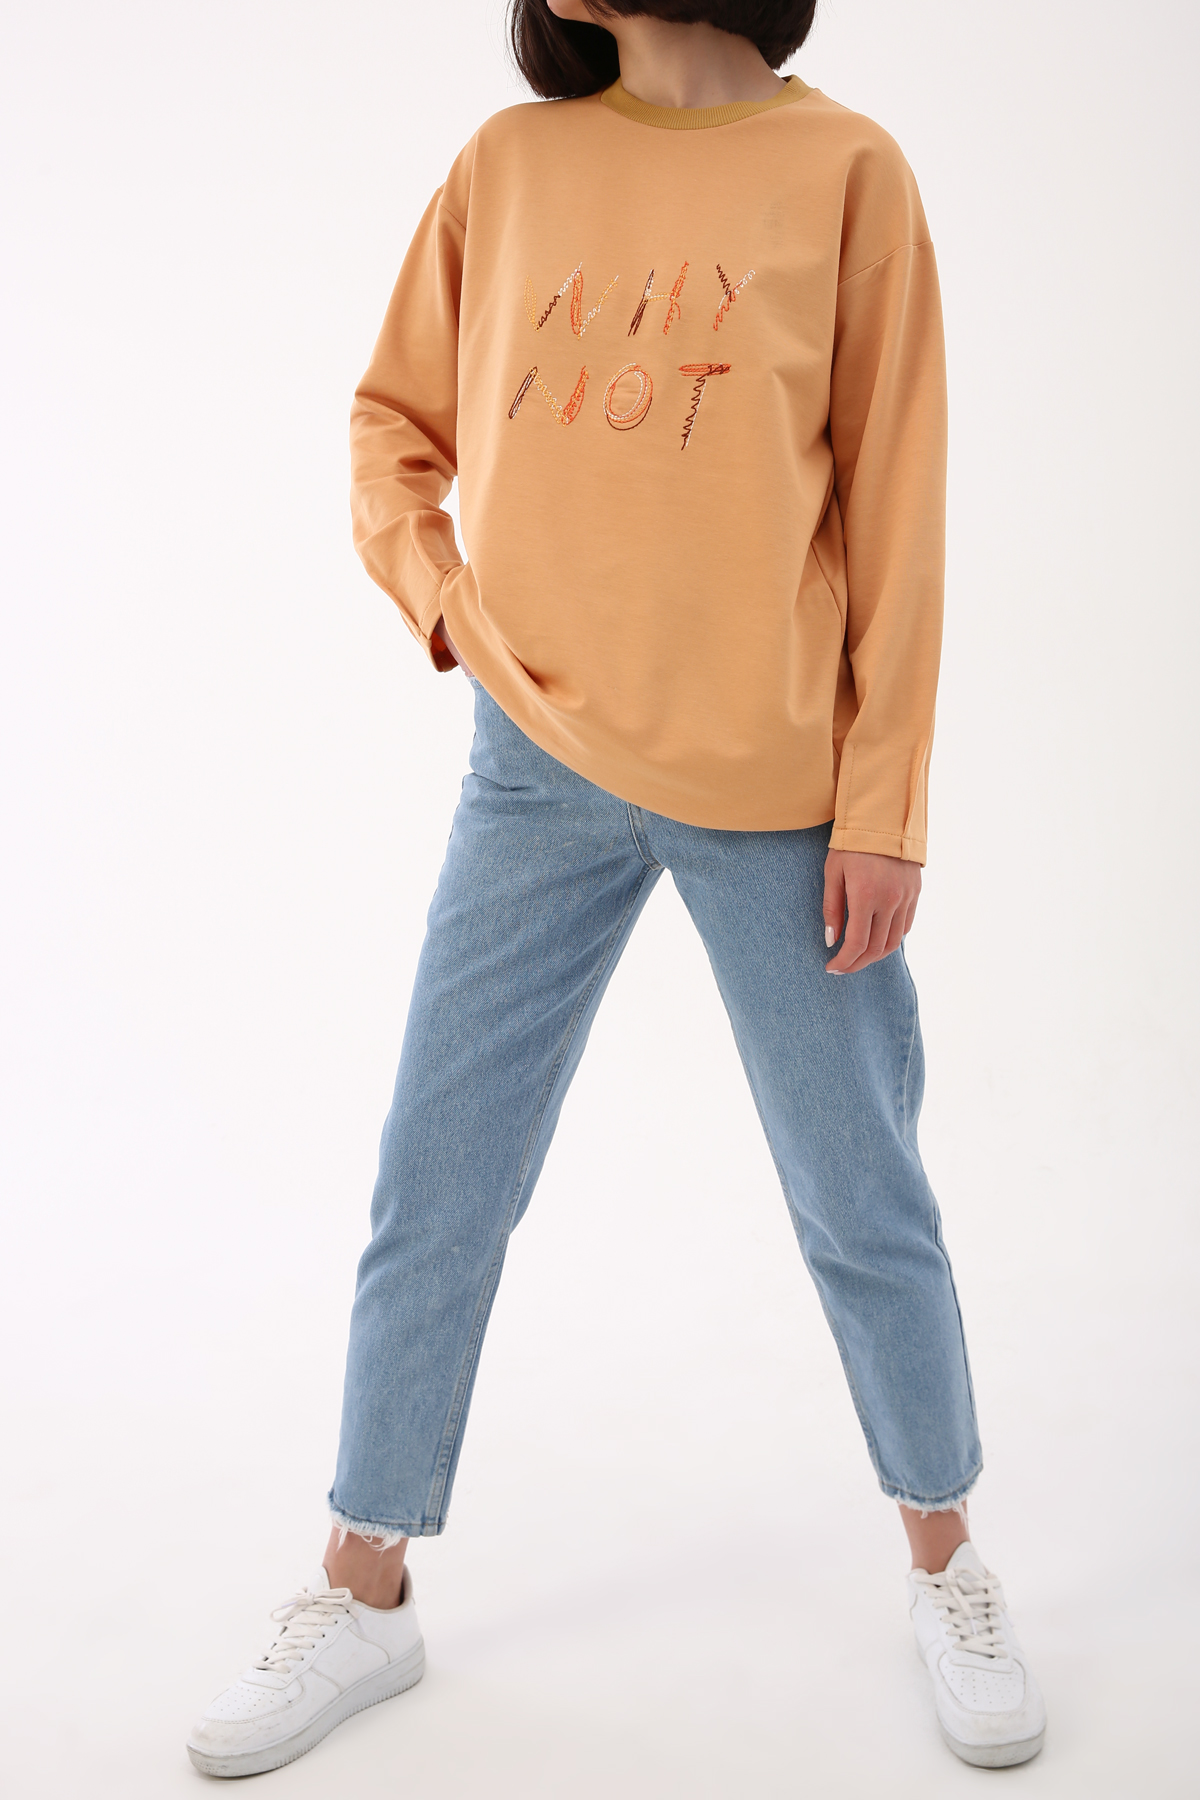 Crew Neck Embroidered Tunic